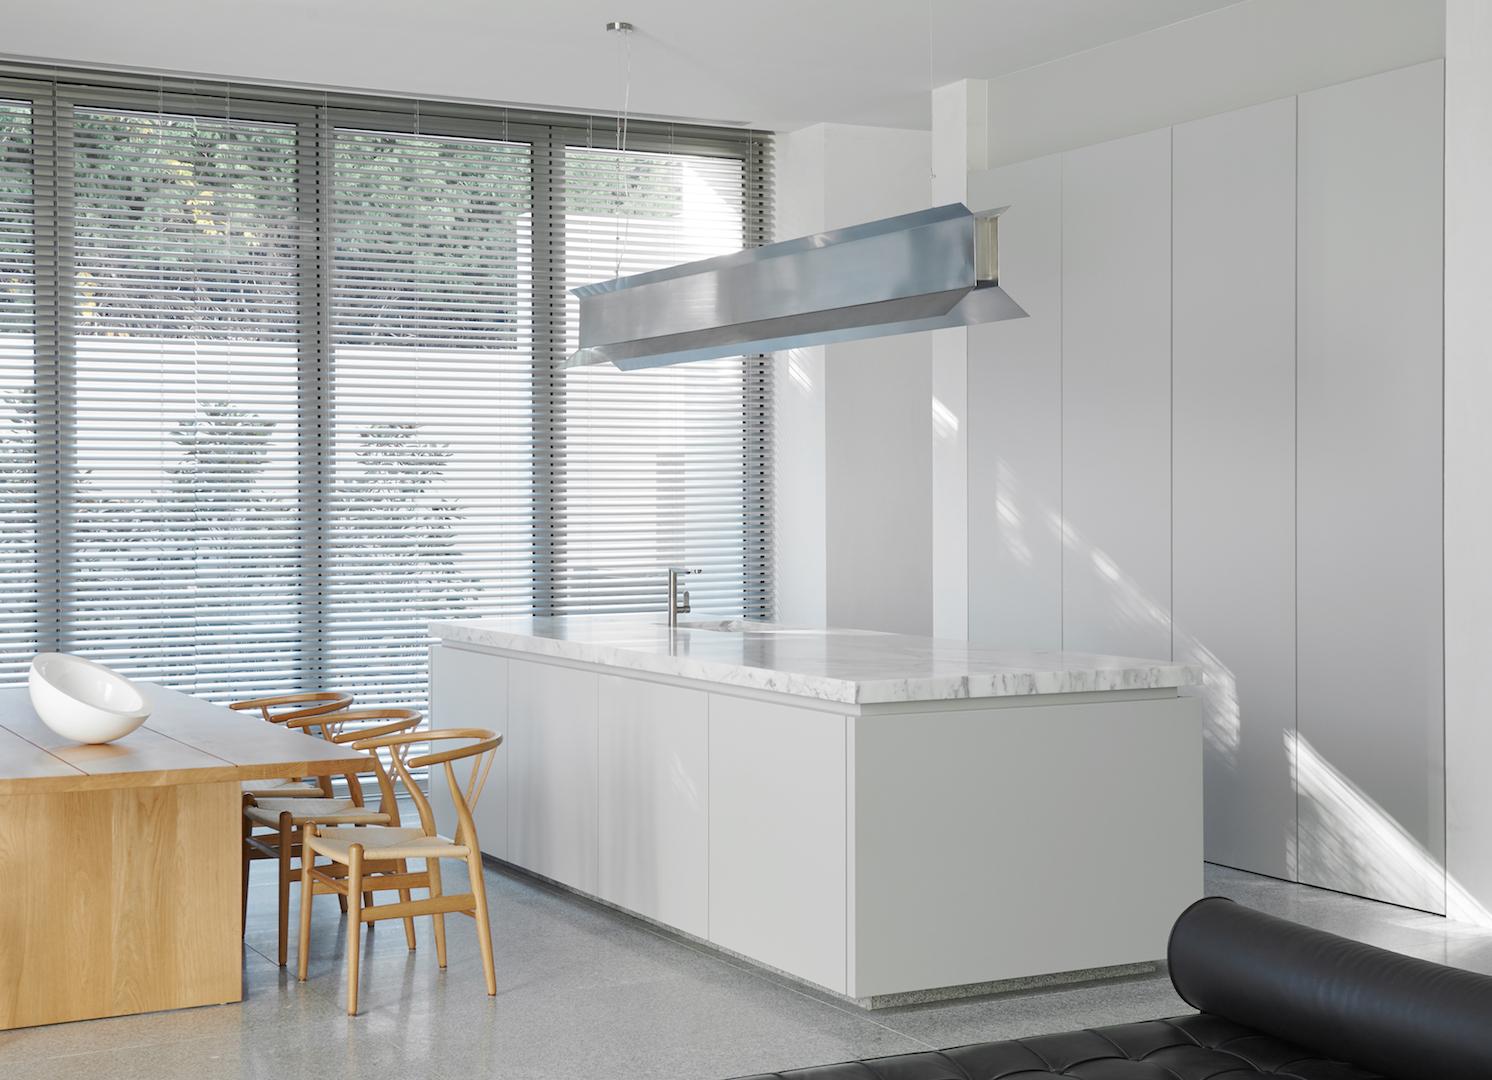 est living toorak house davidov architects 8